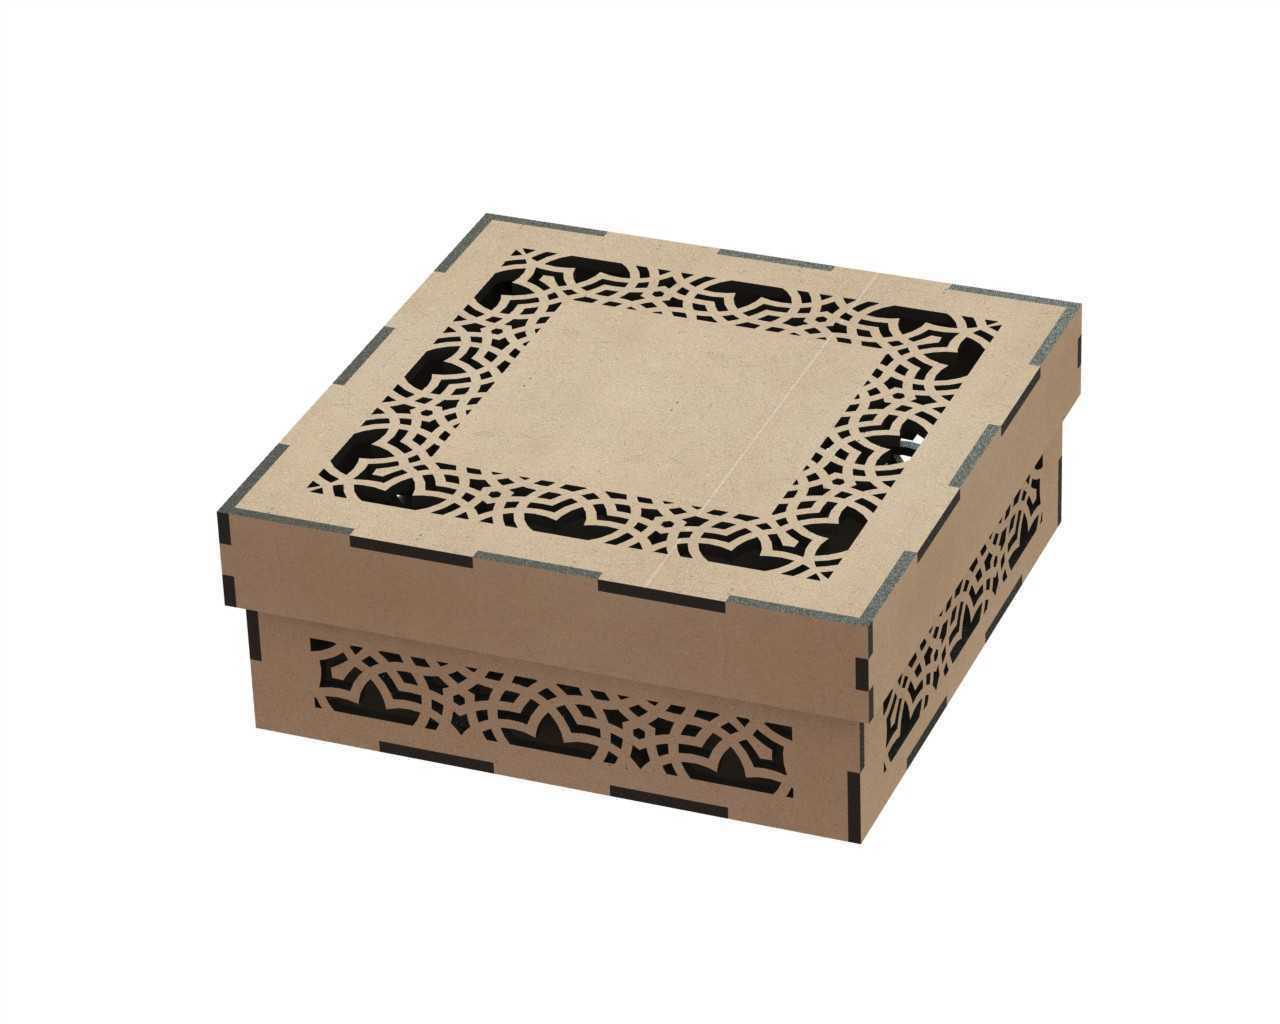 Cnc Laser Cut Engraved Gift Box Free DXF File